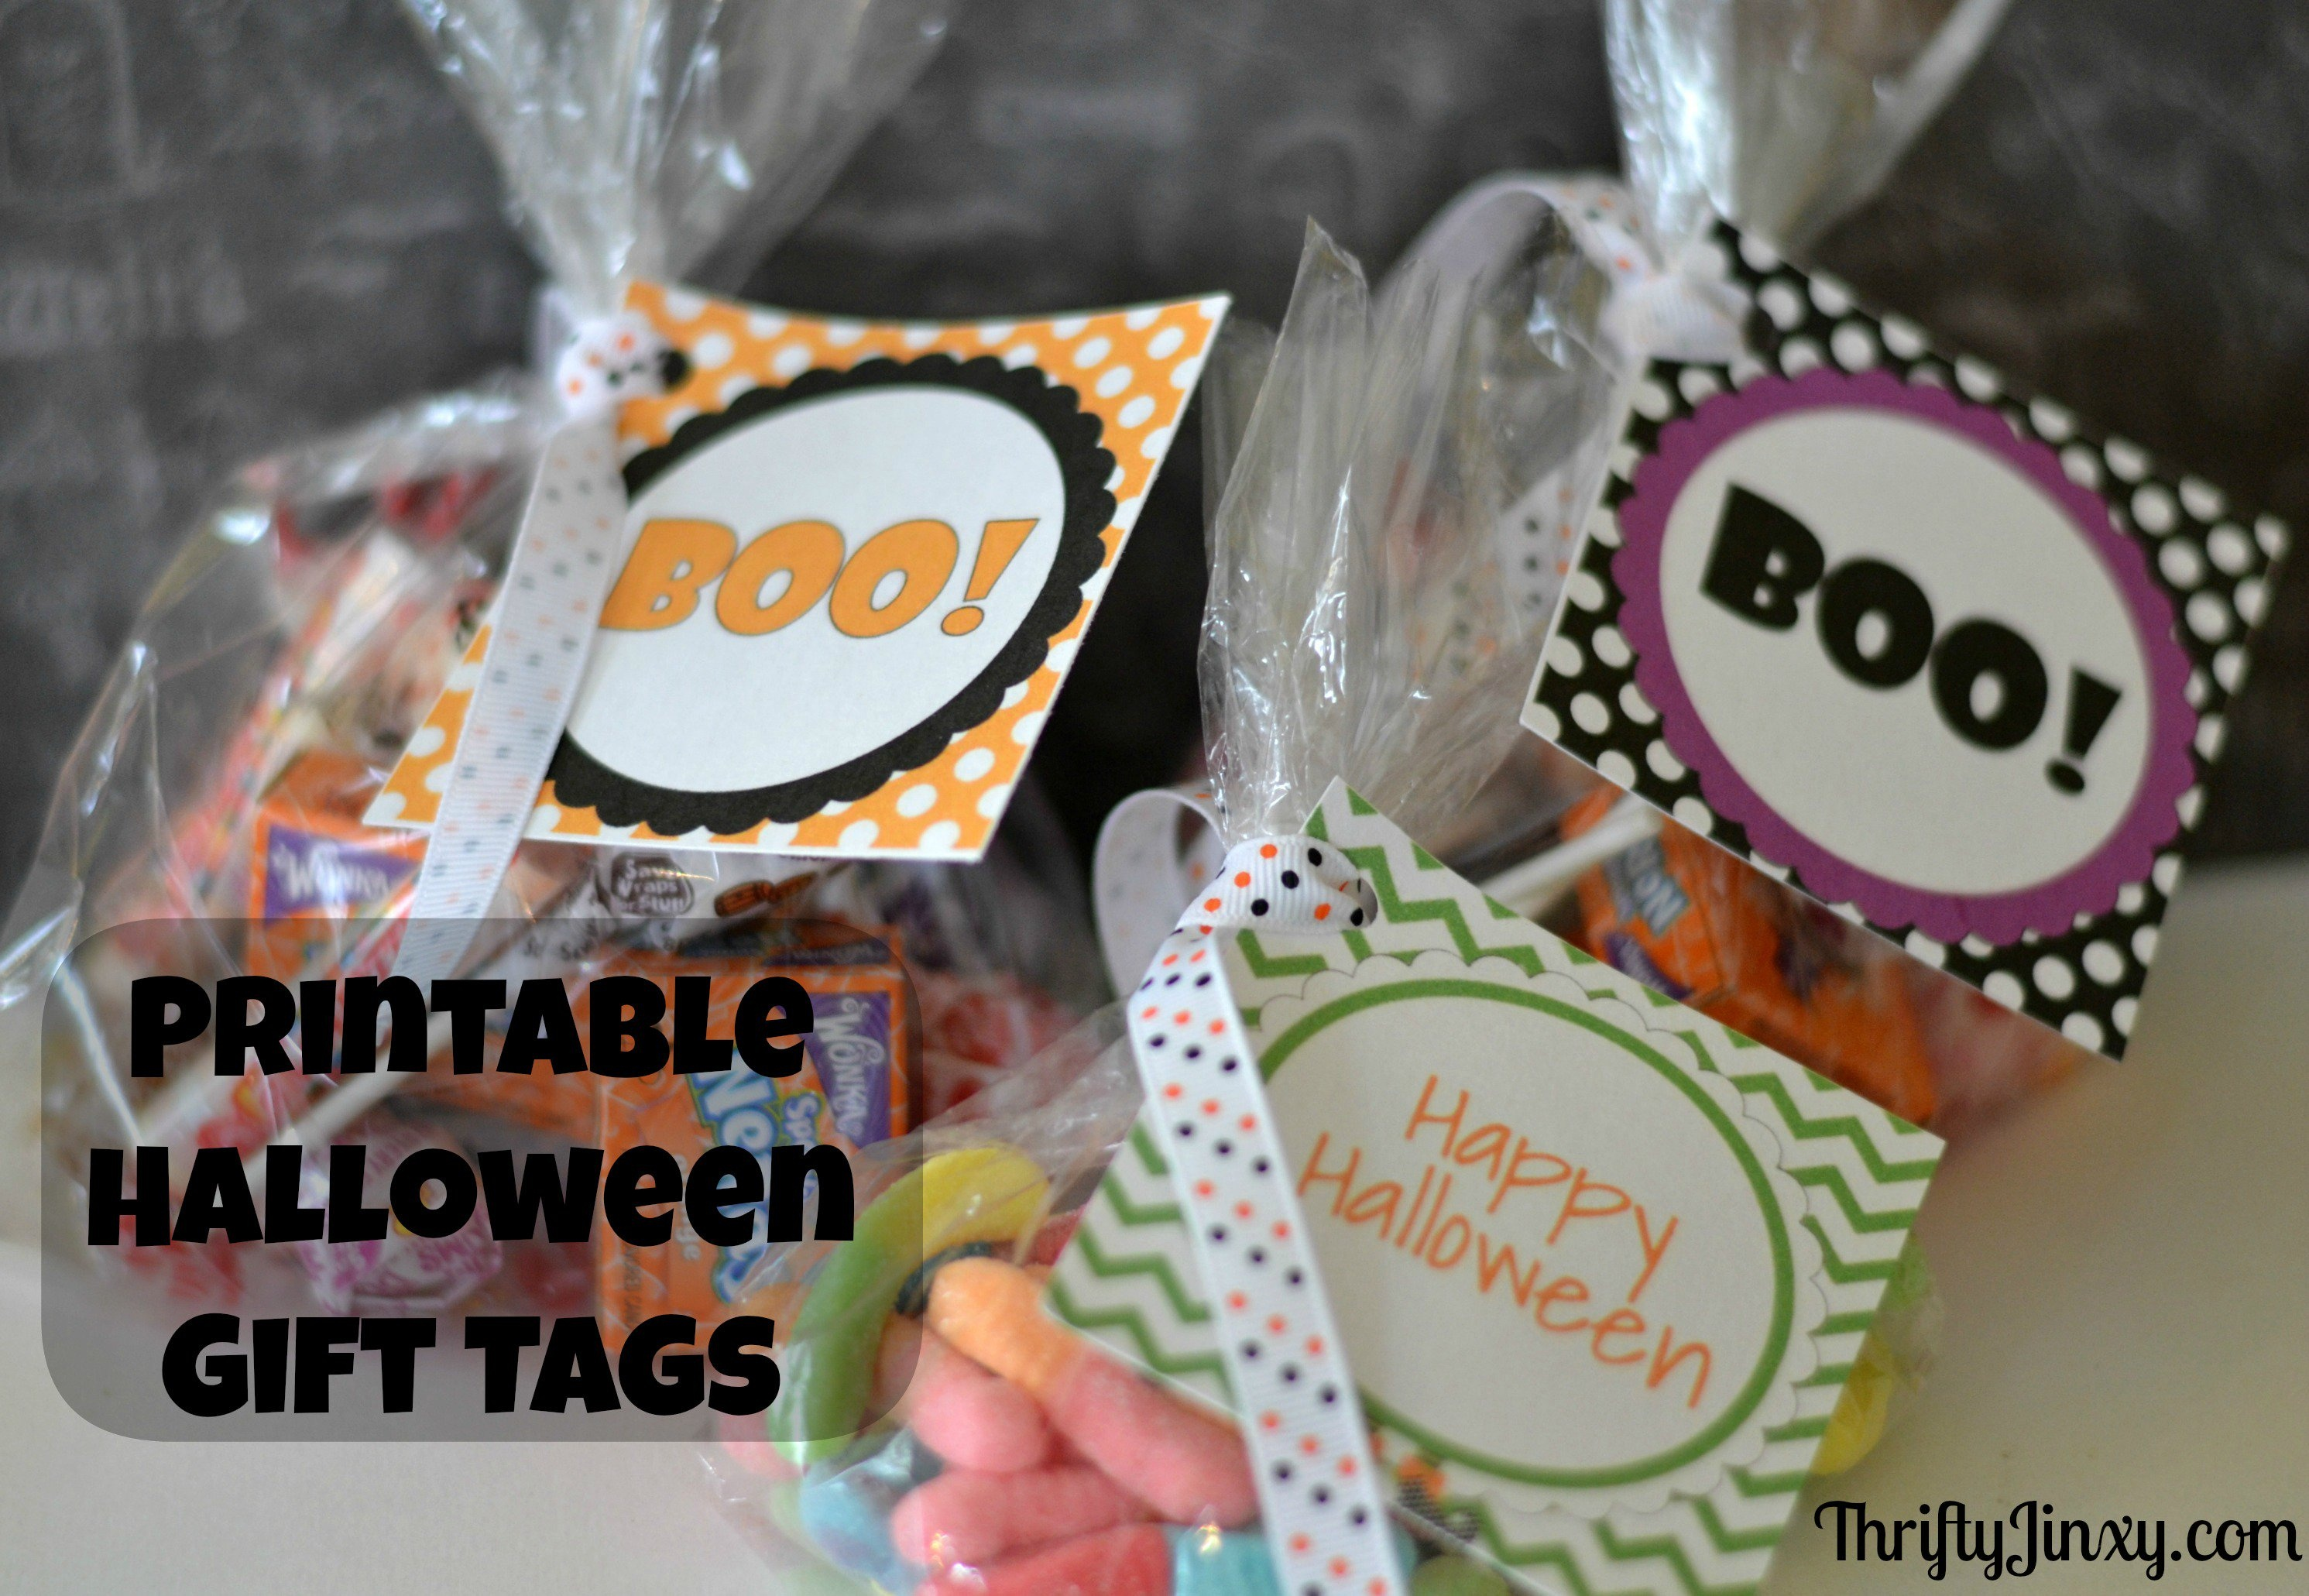 Free Printable Halloween Gift Tags And Treat Bag Tags - Thrifty Jinxy - Free Printable Goodie Bag Tags